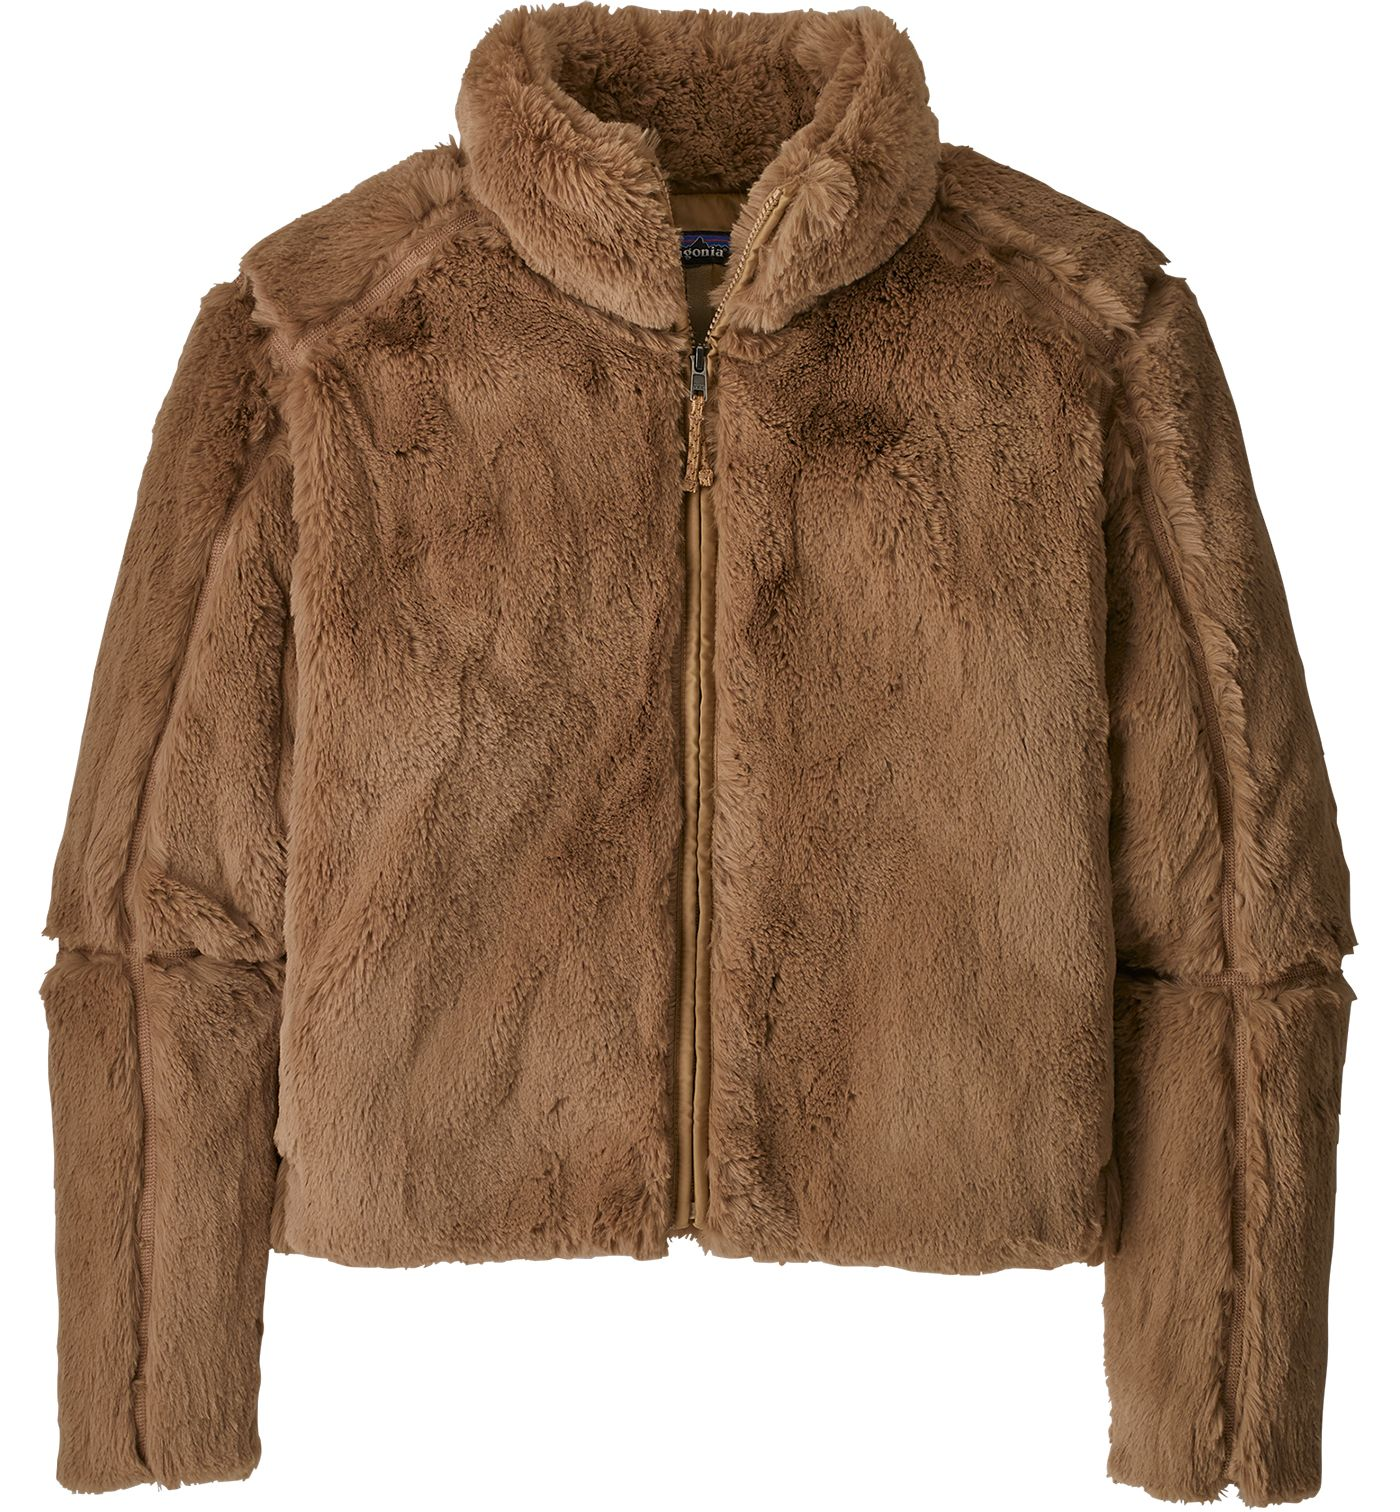 Patagonia Women's Lunar Frost Jacket